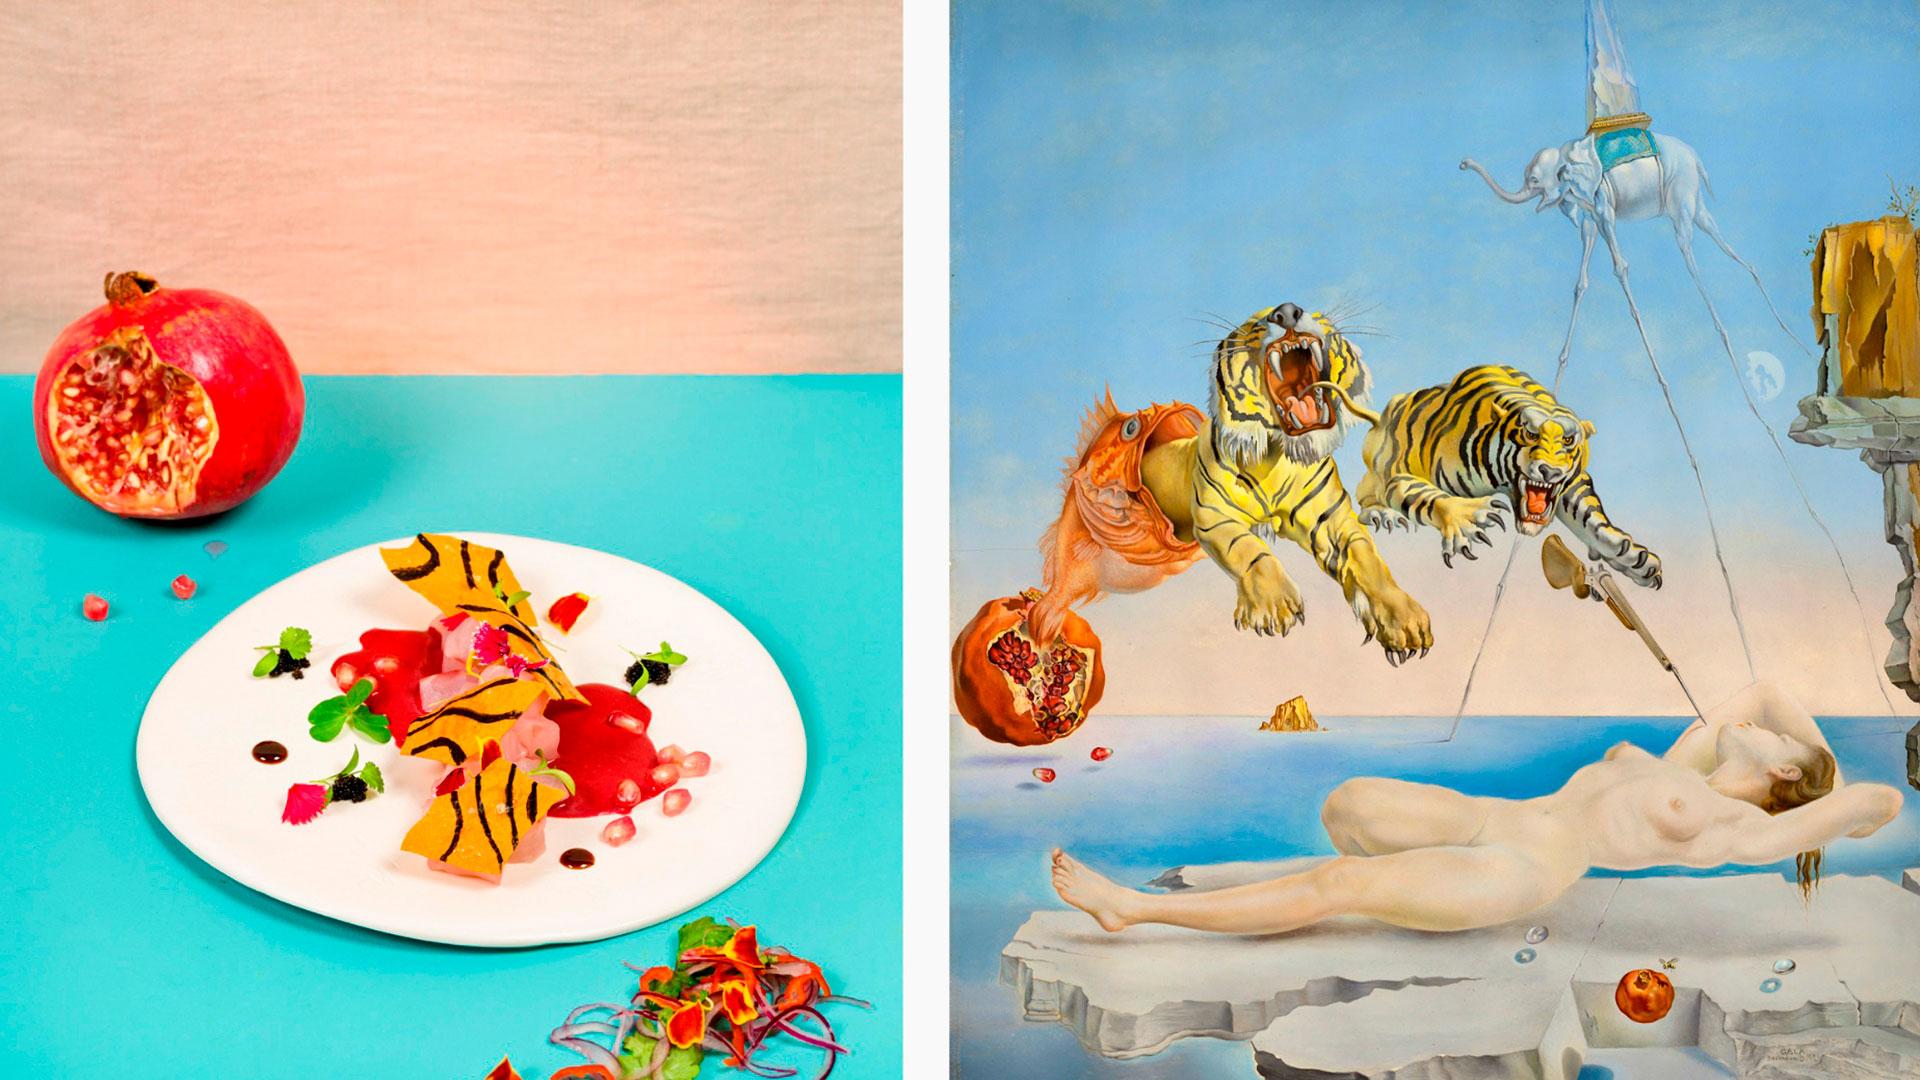 Degustar un cuadro de Dalí hero asset